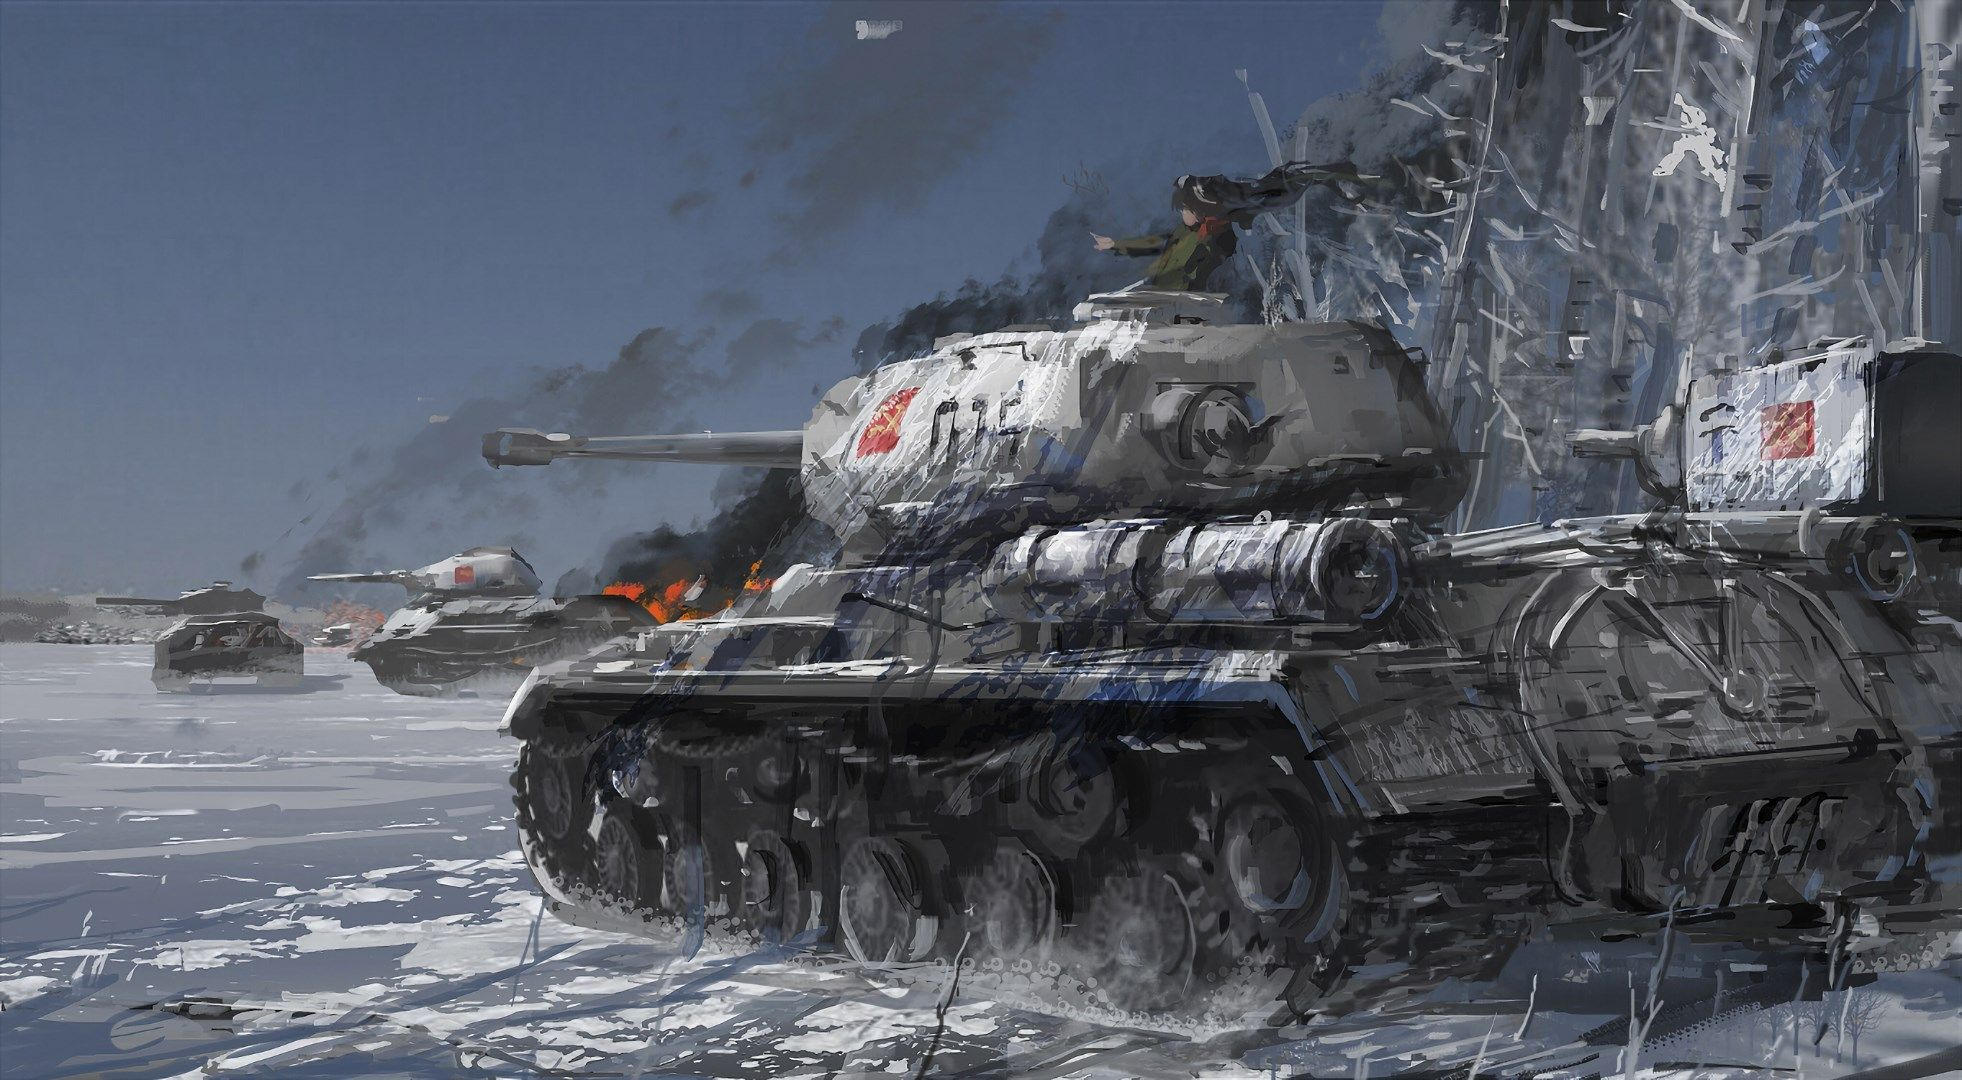 1962x1080 Wallpaper Desktop Girls Und Panzer Anime Military Anime Tank Military Drawings